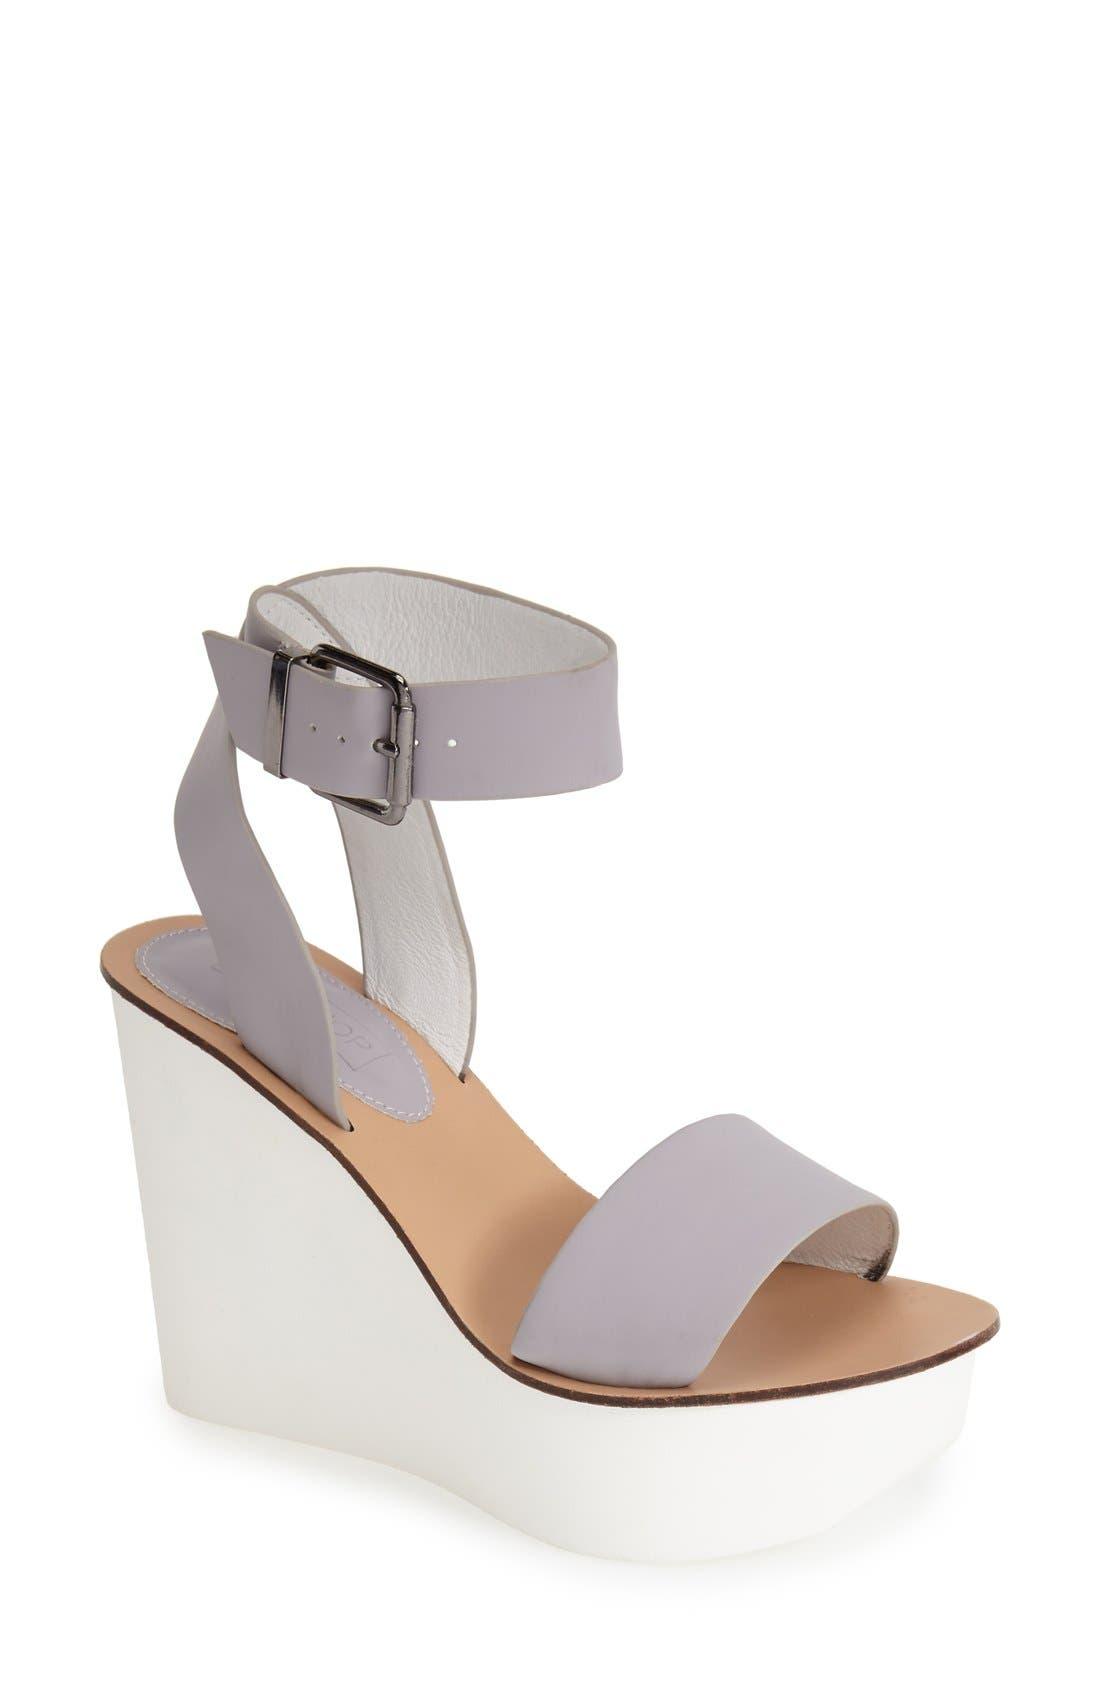 Main Image - Topshop 'Waffle' Platform Wedge Sandal (Women)